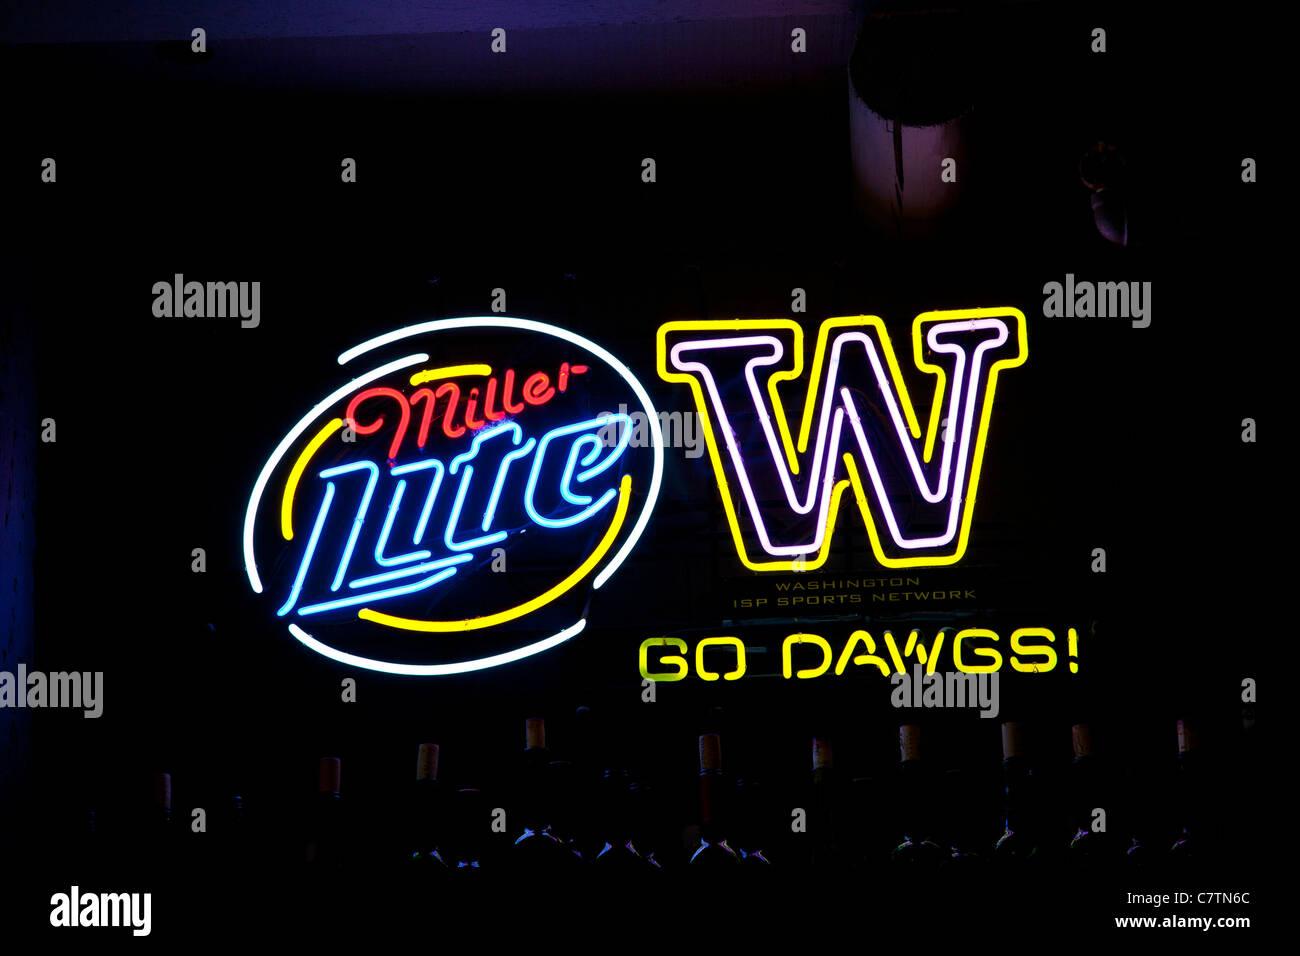 neon restaurant bar sign advertising Miller Lite beer with tie-in logo cheering University of Washington Huskies - Stock Image